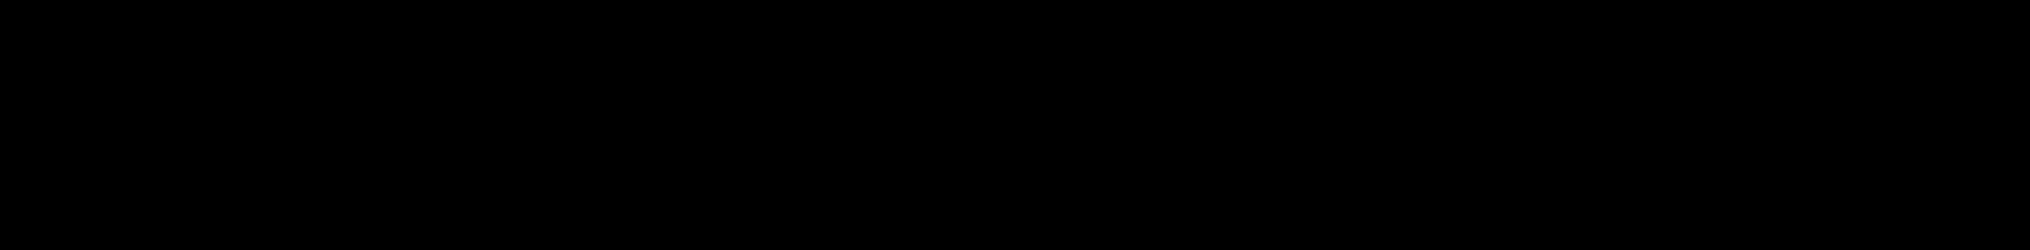 Moto Rosi